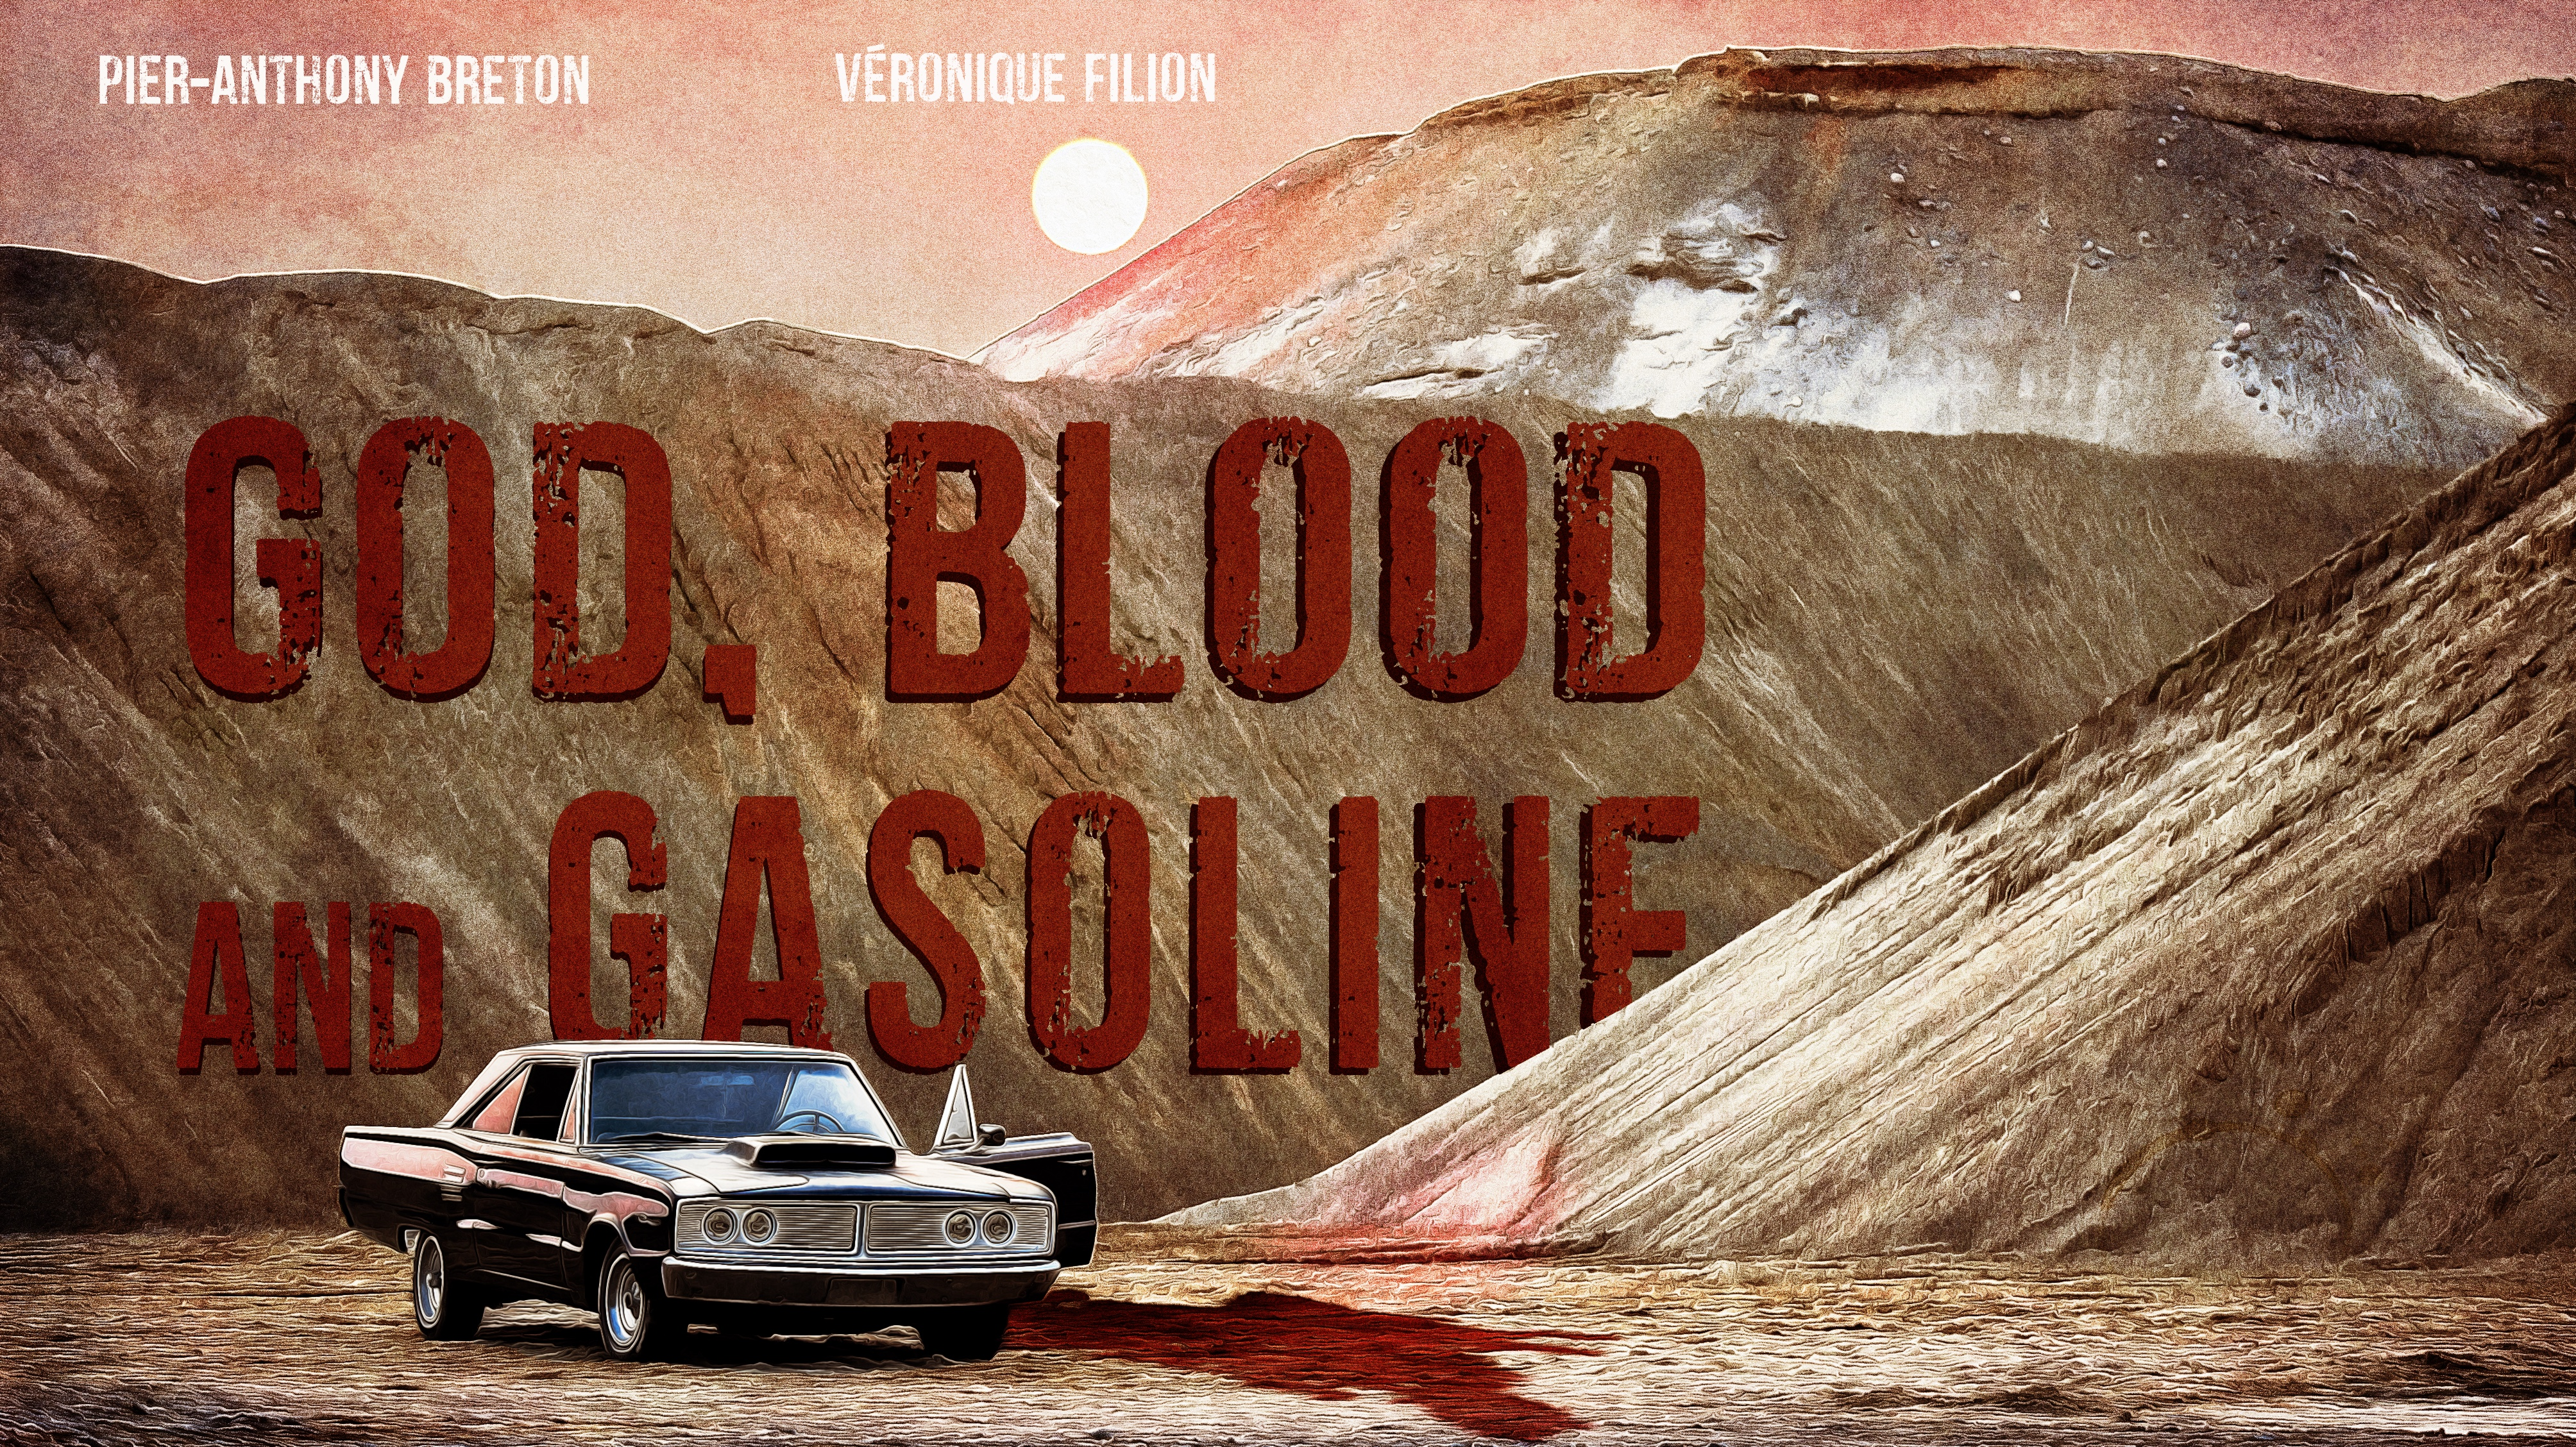 BOJO film God Blood Gasoline